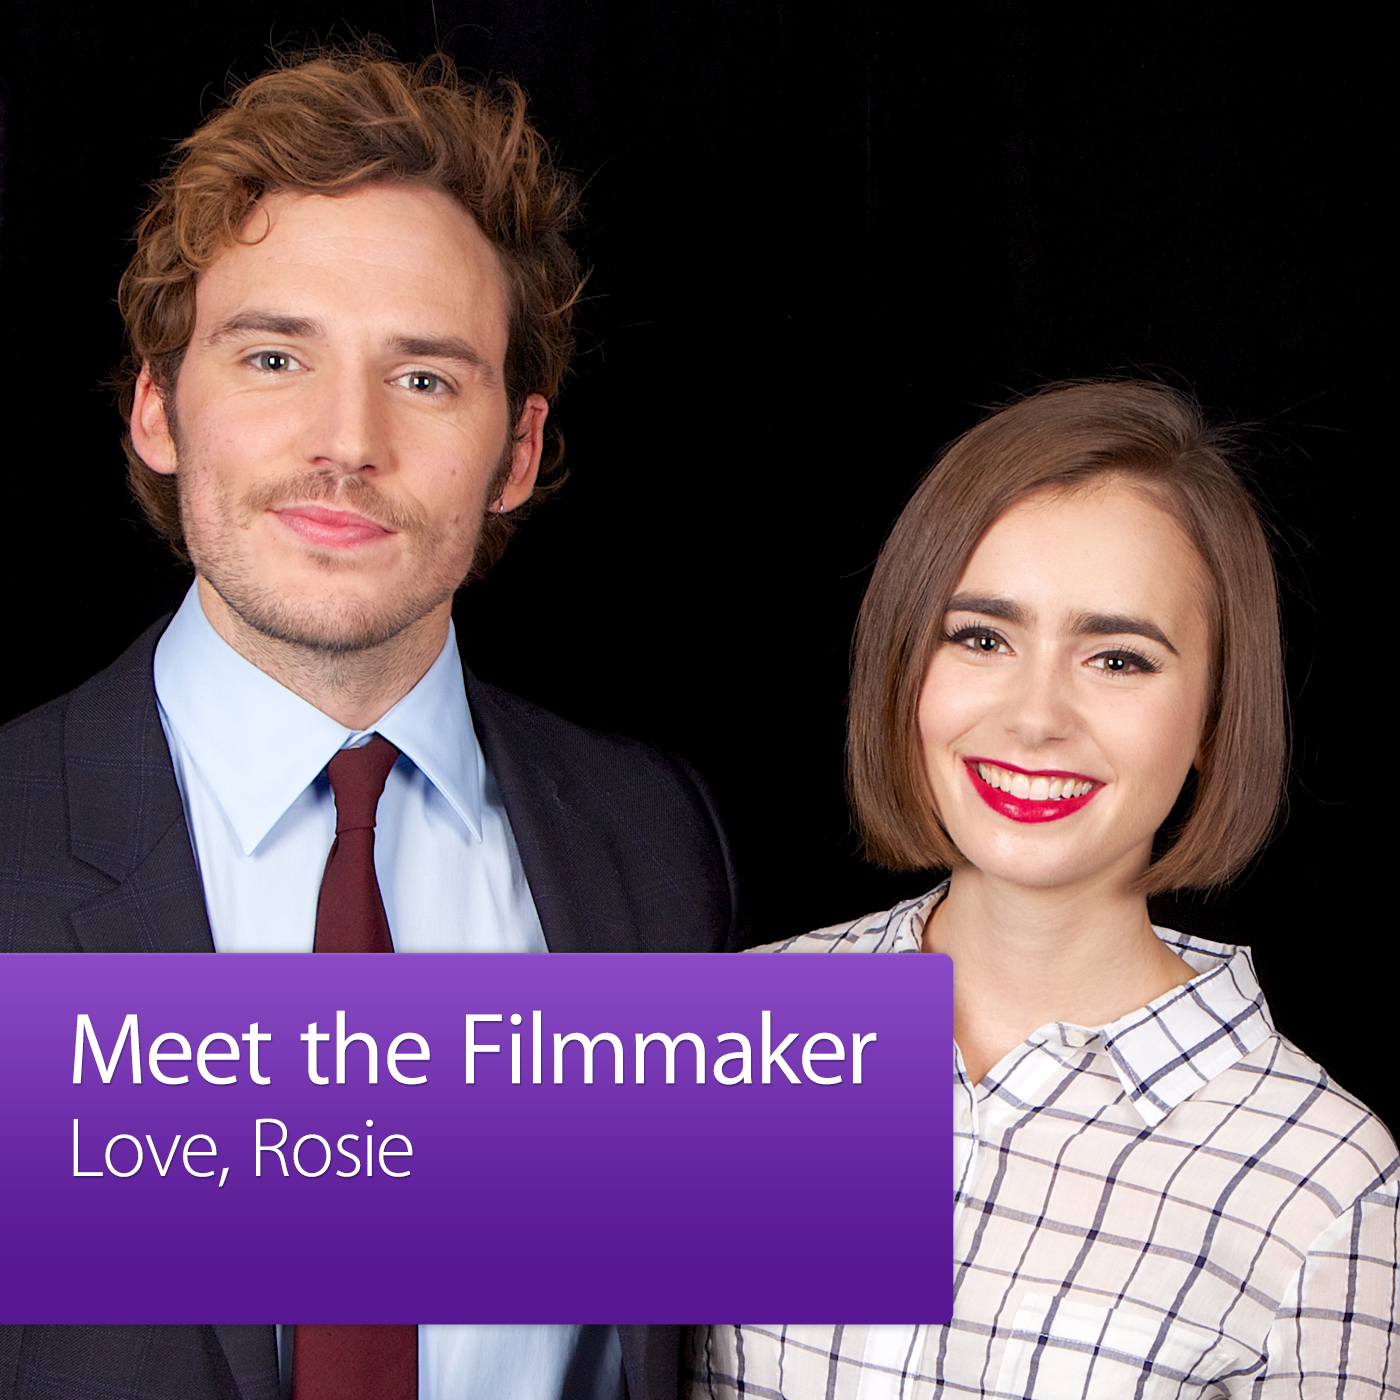 Love, Rosie: Meet the Filmmaker